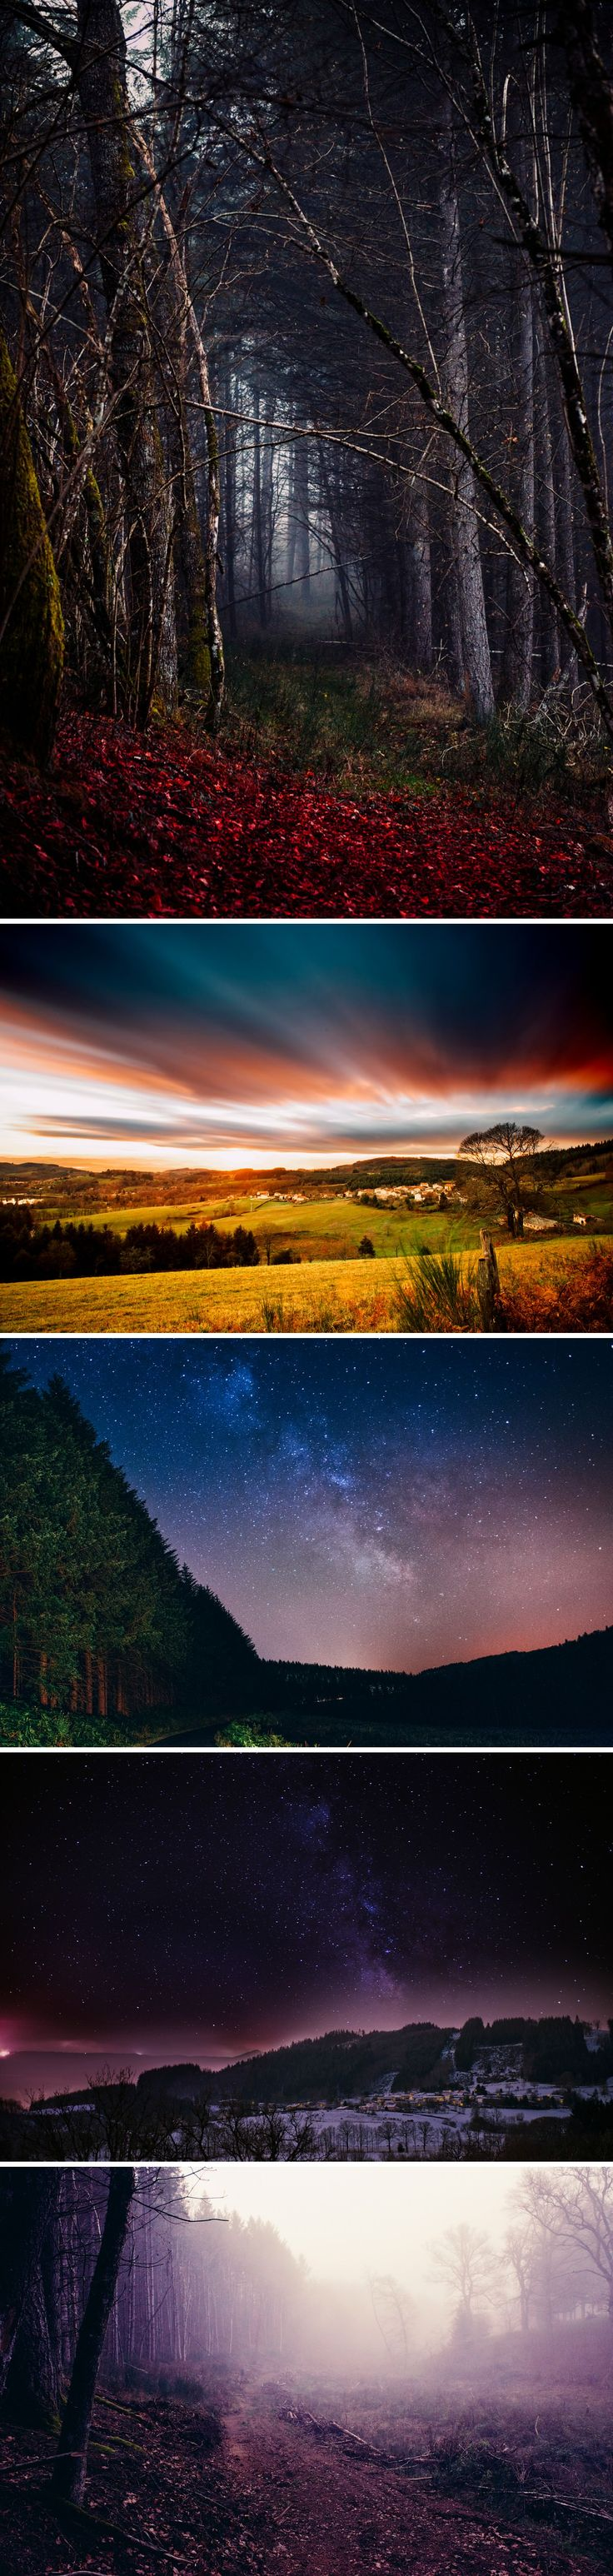 Montagne Thiernoise - Around Thiers, Central France - Livradois Forez - Zephyr & Luna photograhy